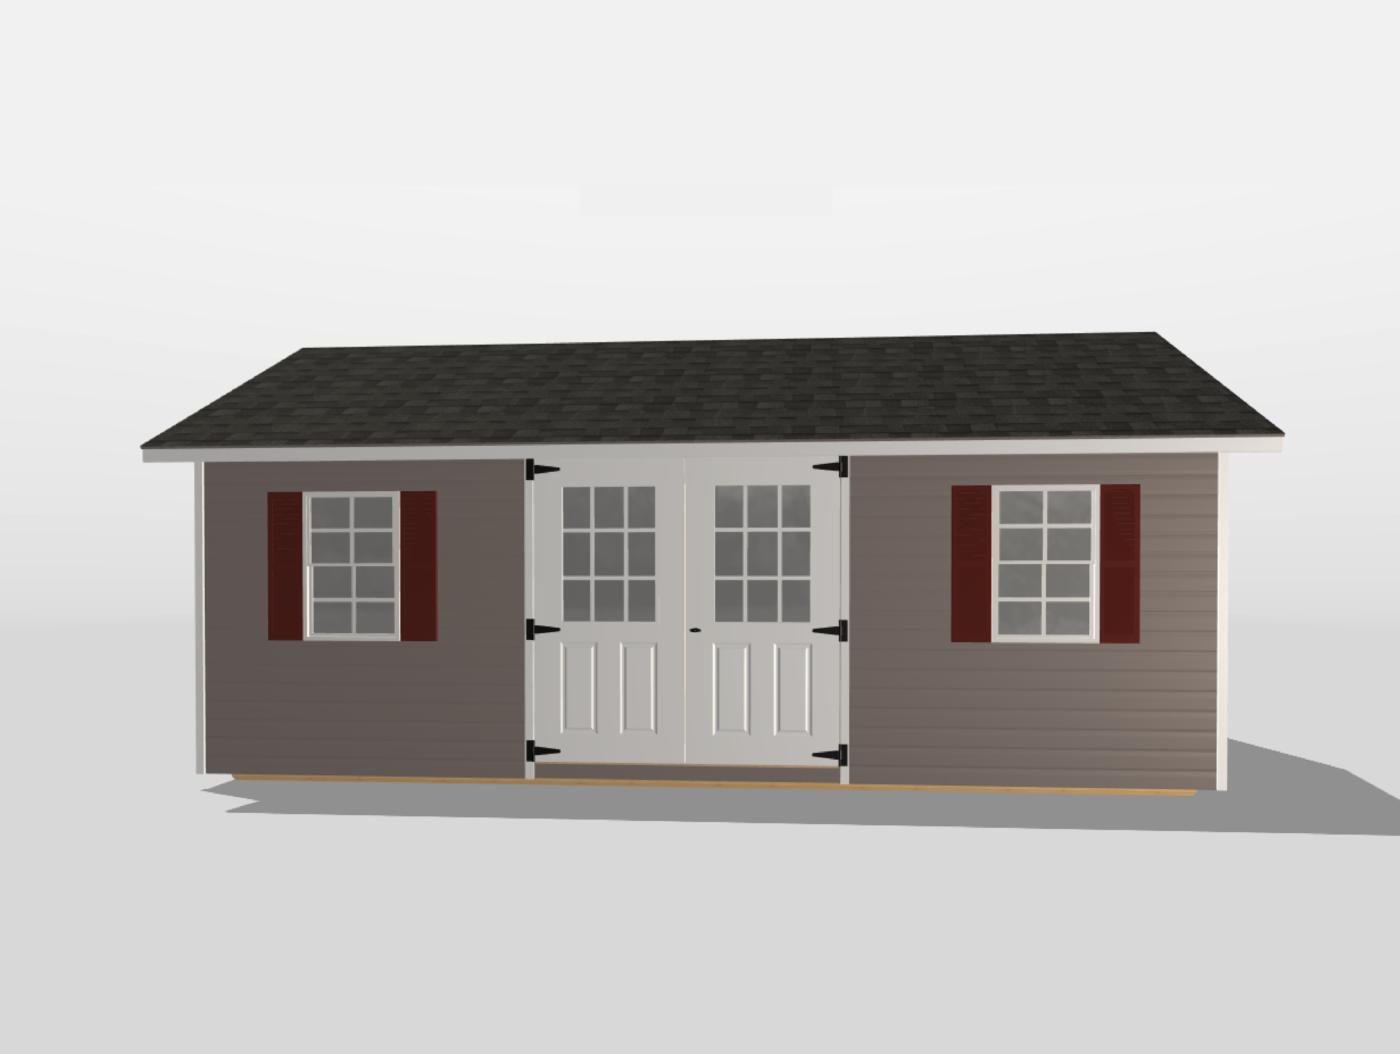 12x20 shed 3d builder